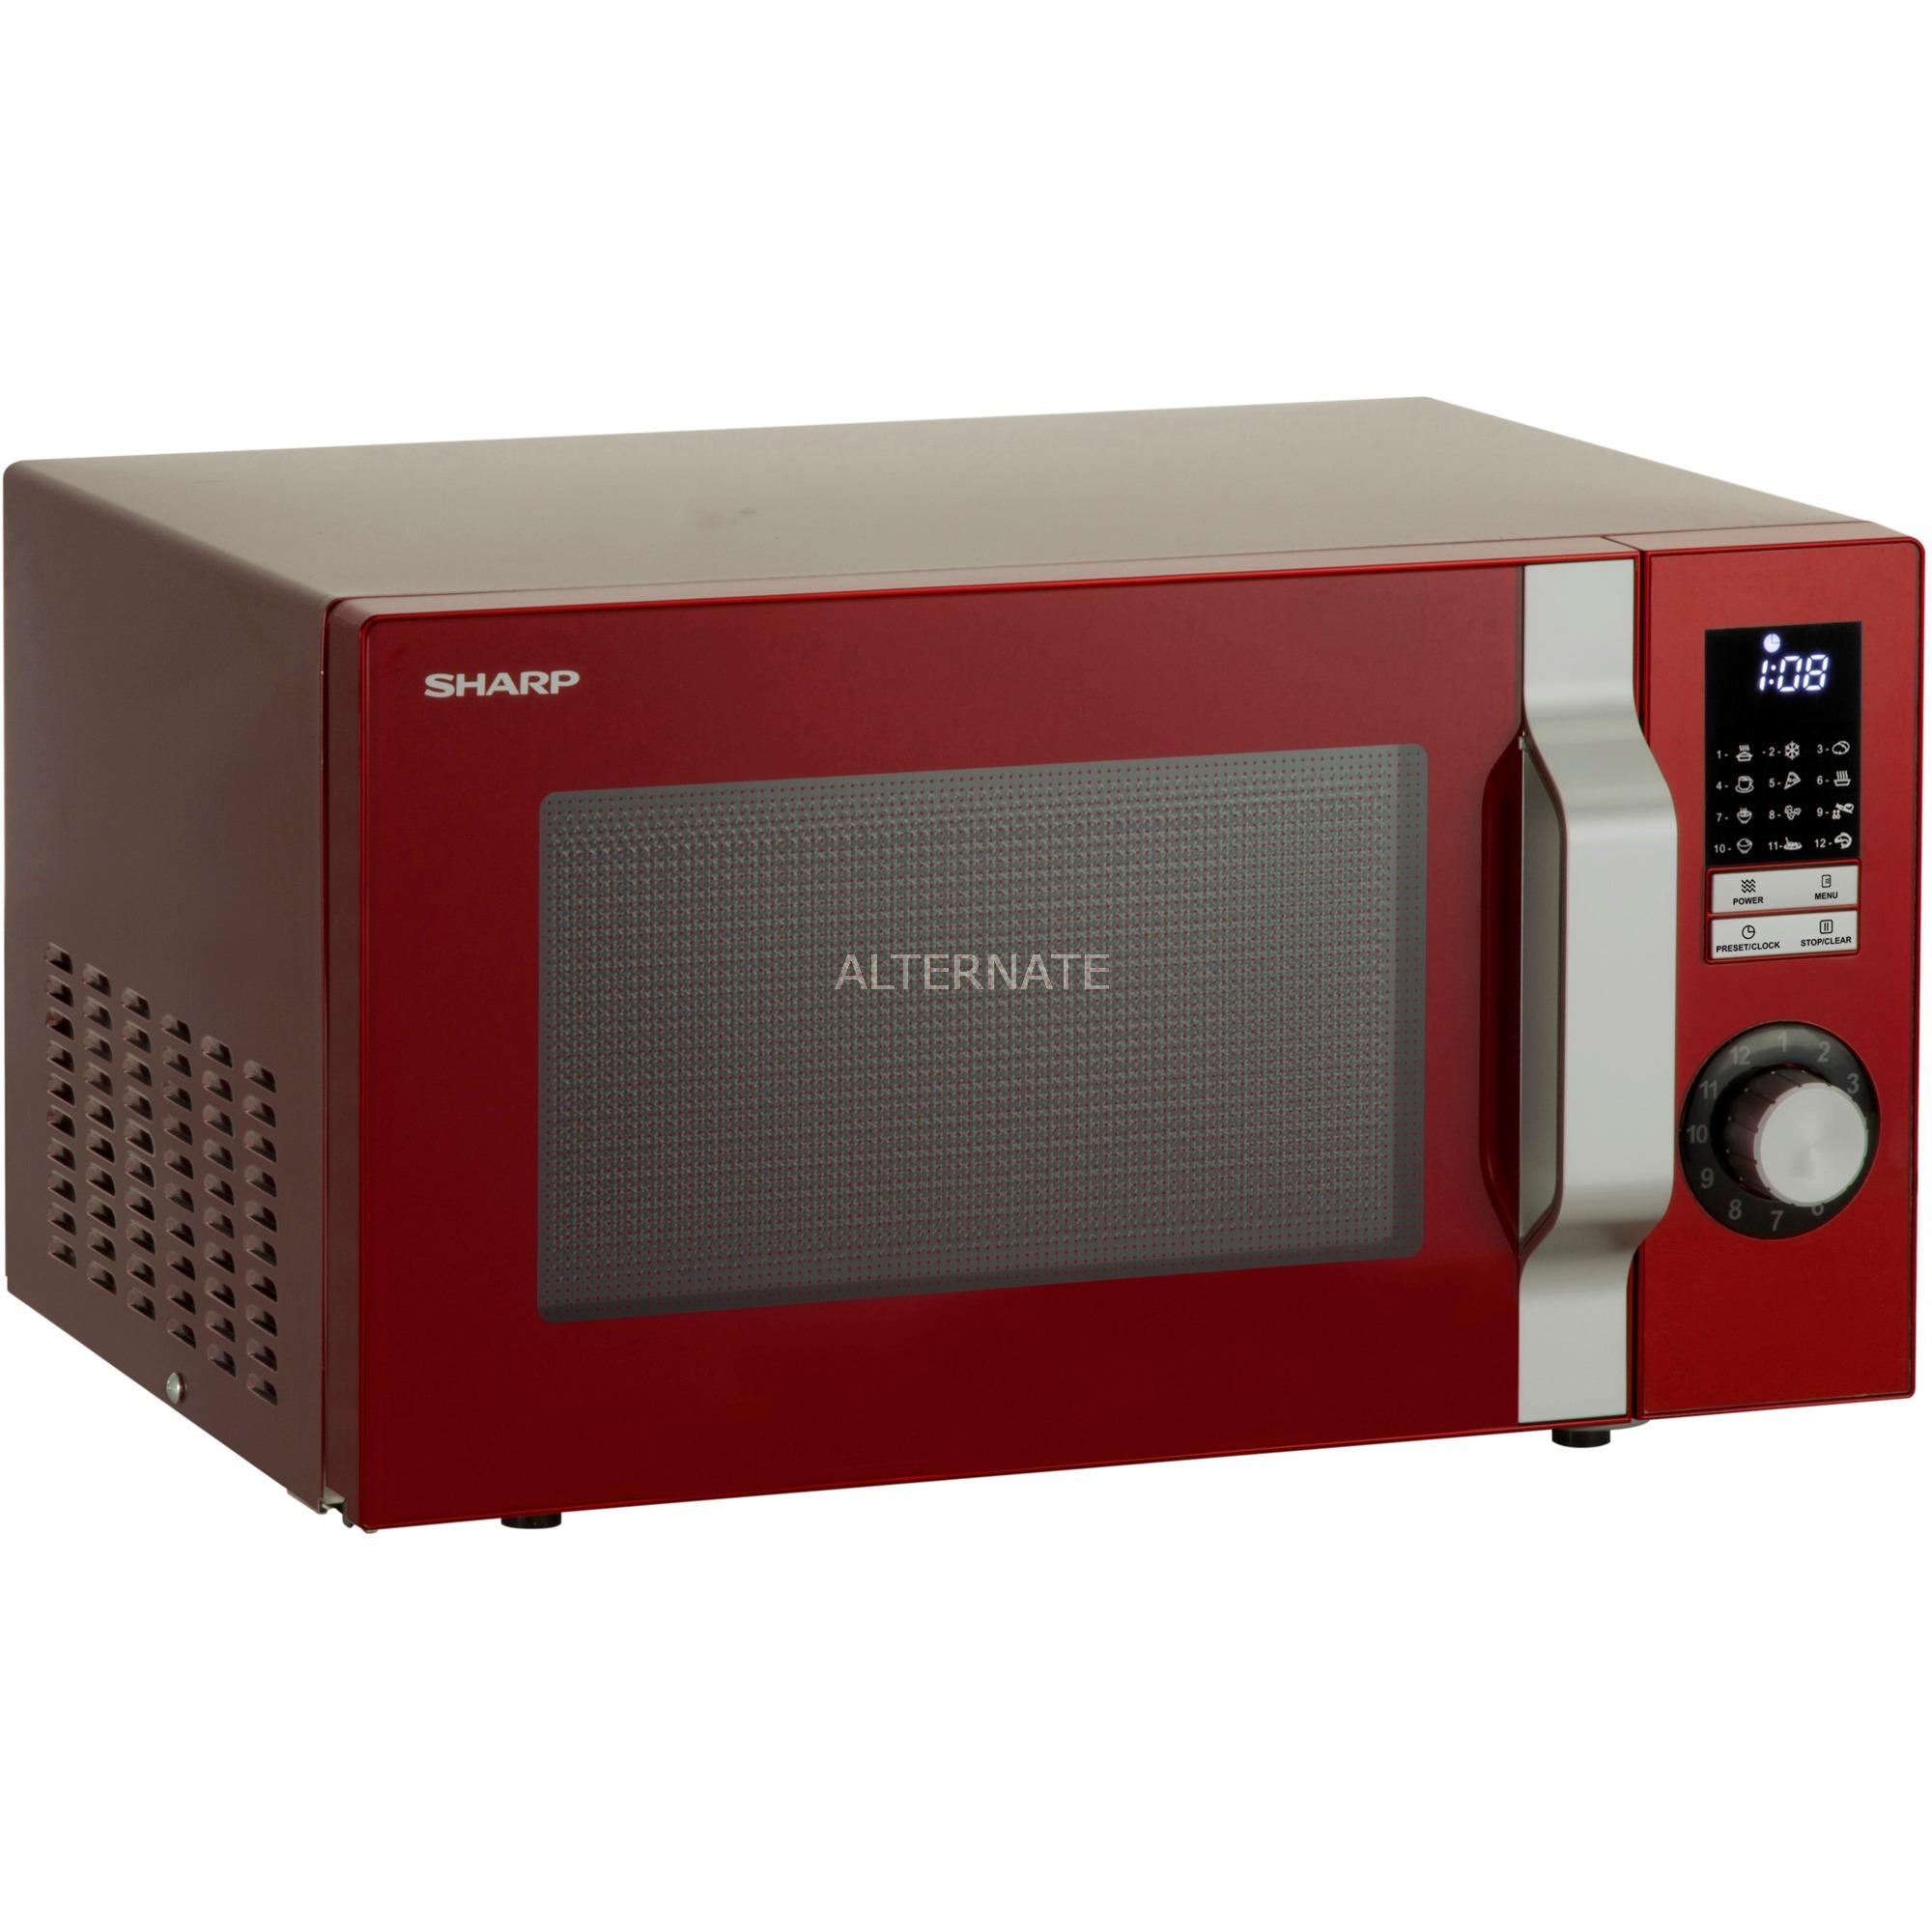 R-344RD Mikrowelle / 900 W / 25 L / LED-Display / Zeitschaltuhr / 12 Automatikprogramme / Rot Encimera Solo microondas Rojo